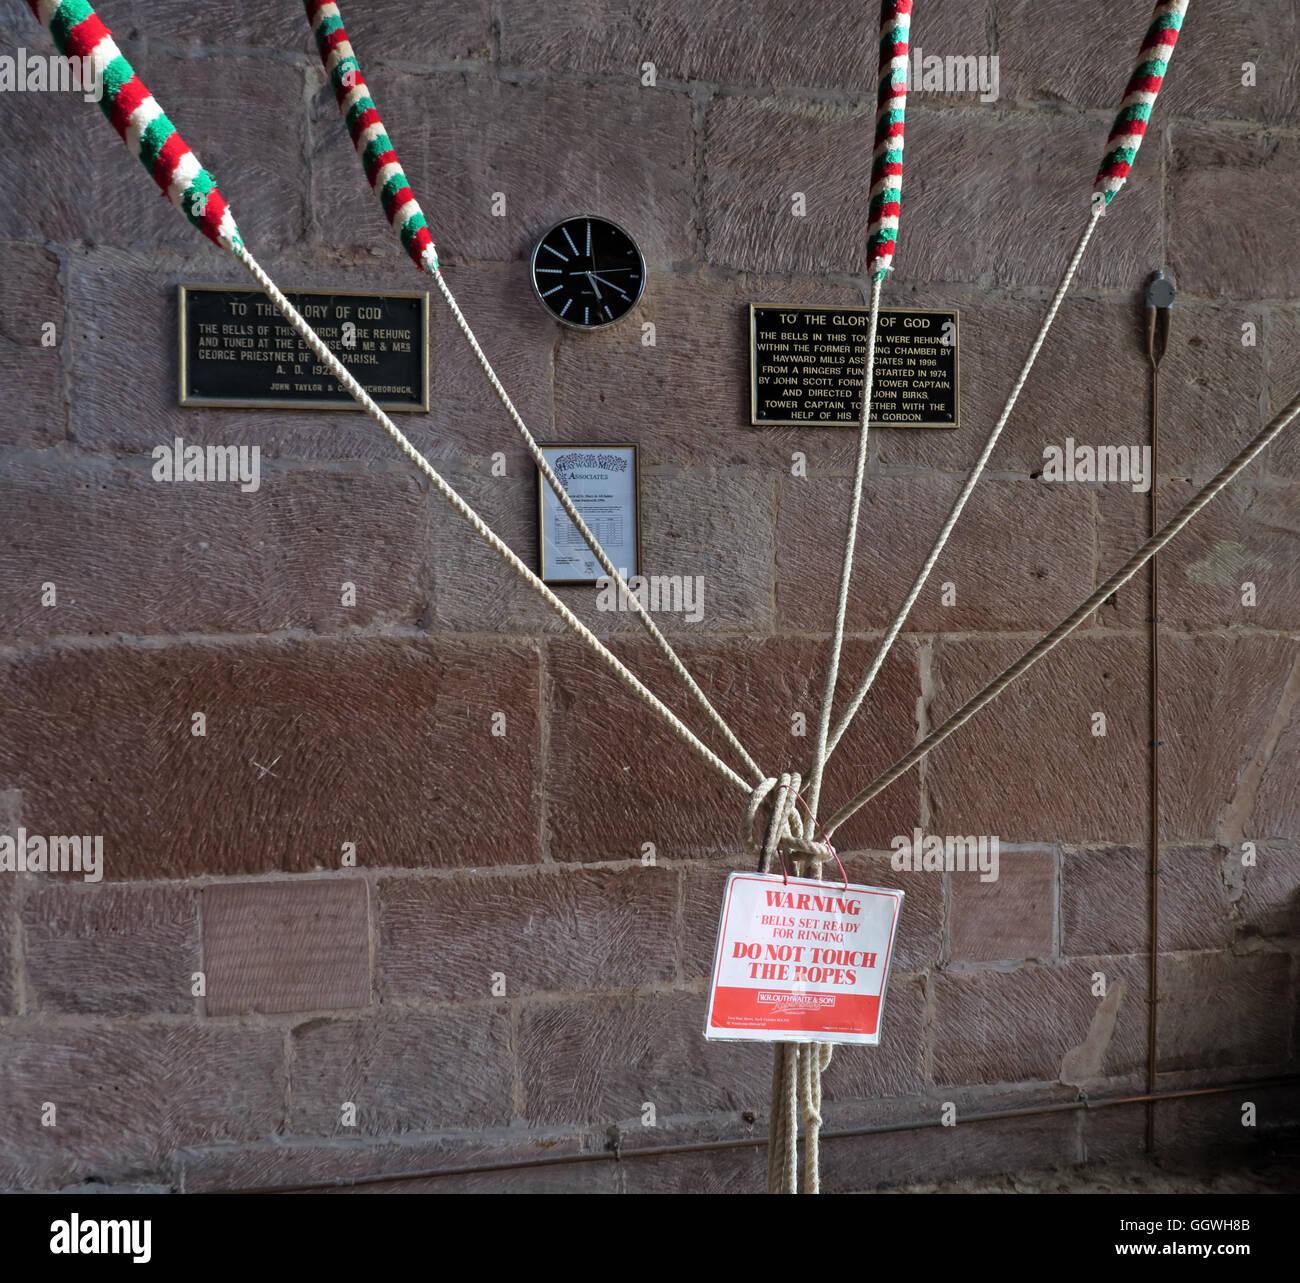 Laden Sie dieses Alamy Stockfoto Glocke Klingeln Seile, St. Marys Church, Gt Budworth, Cheshire, England, UK - GGWH8B